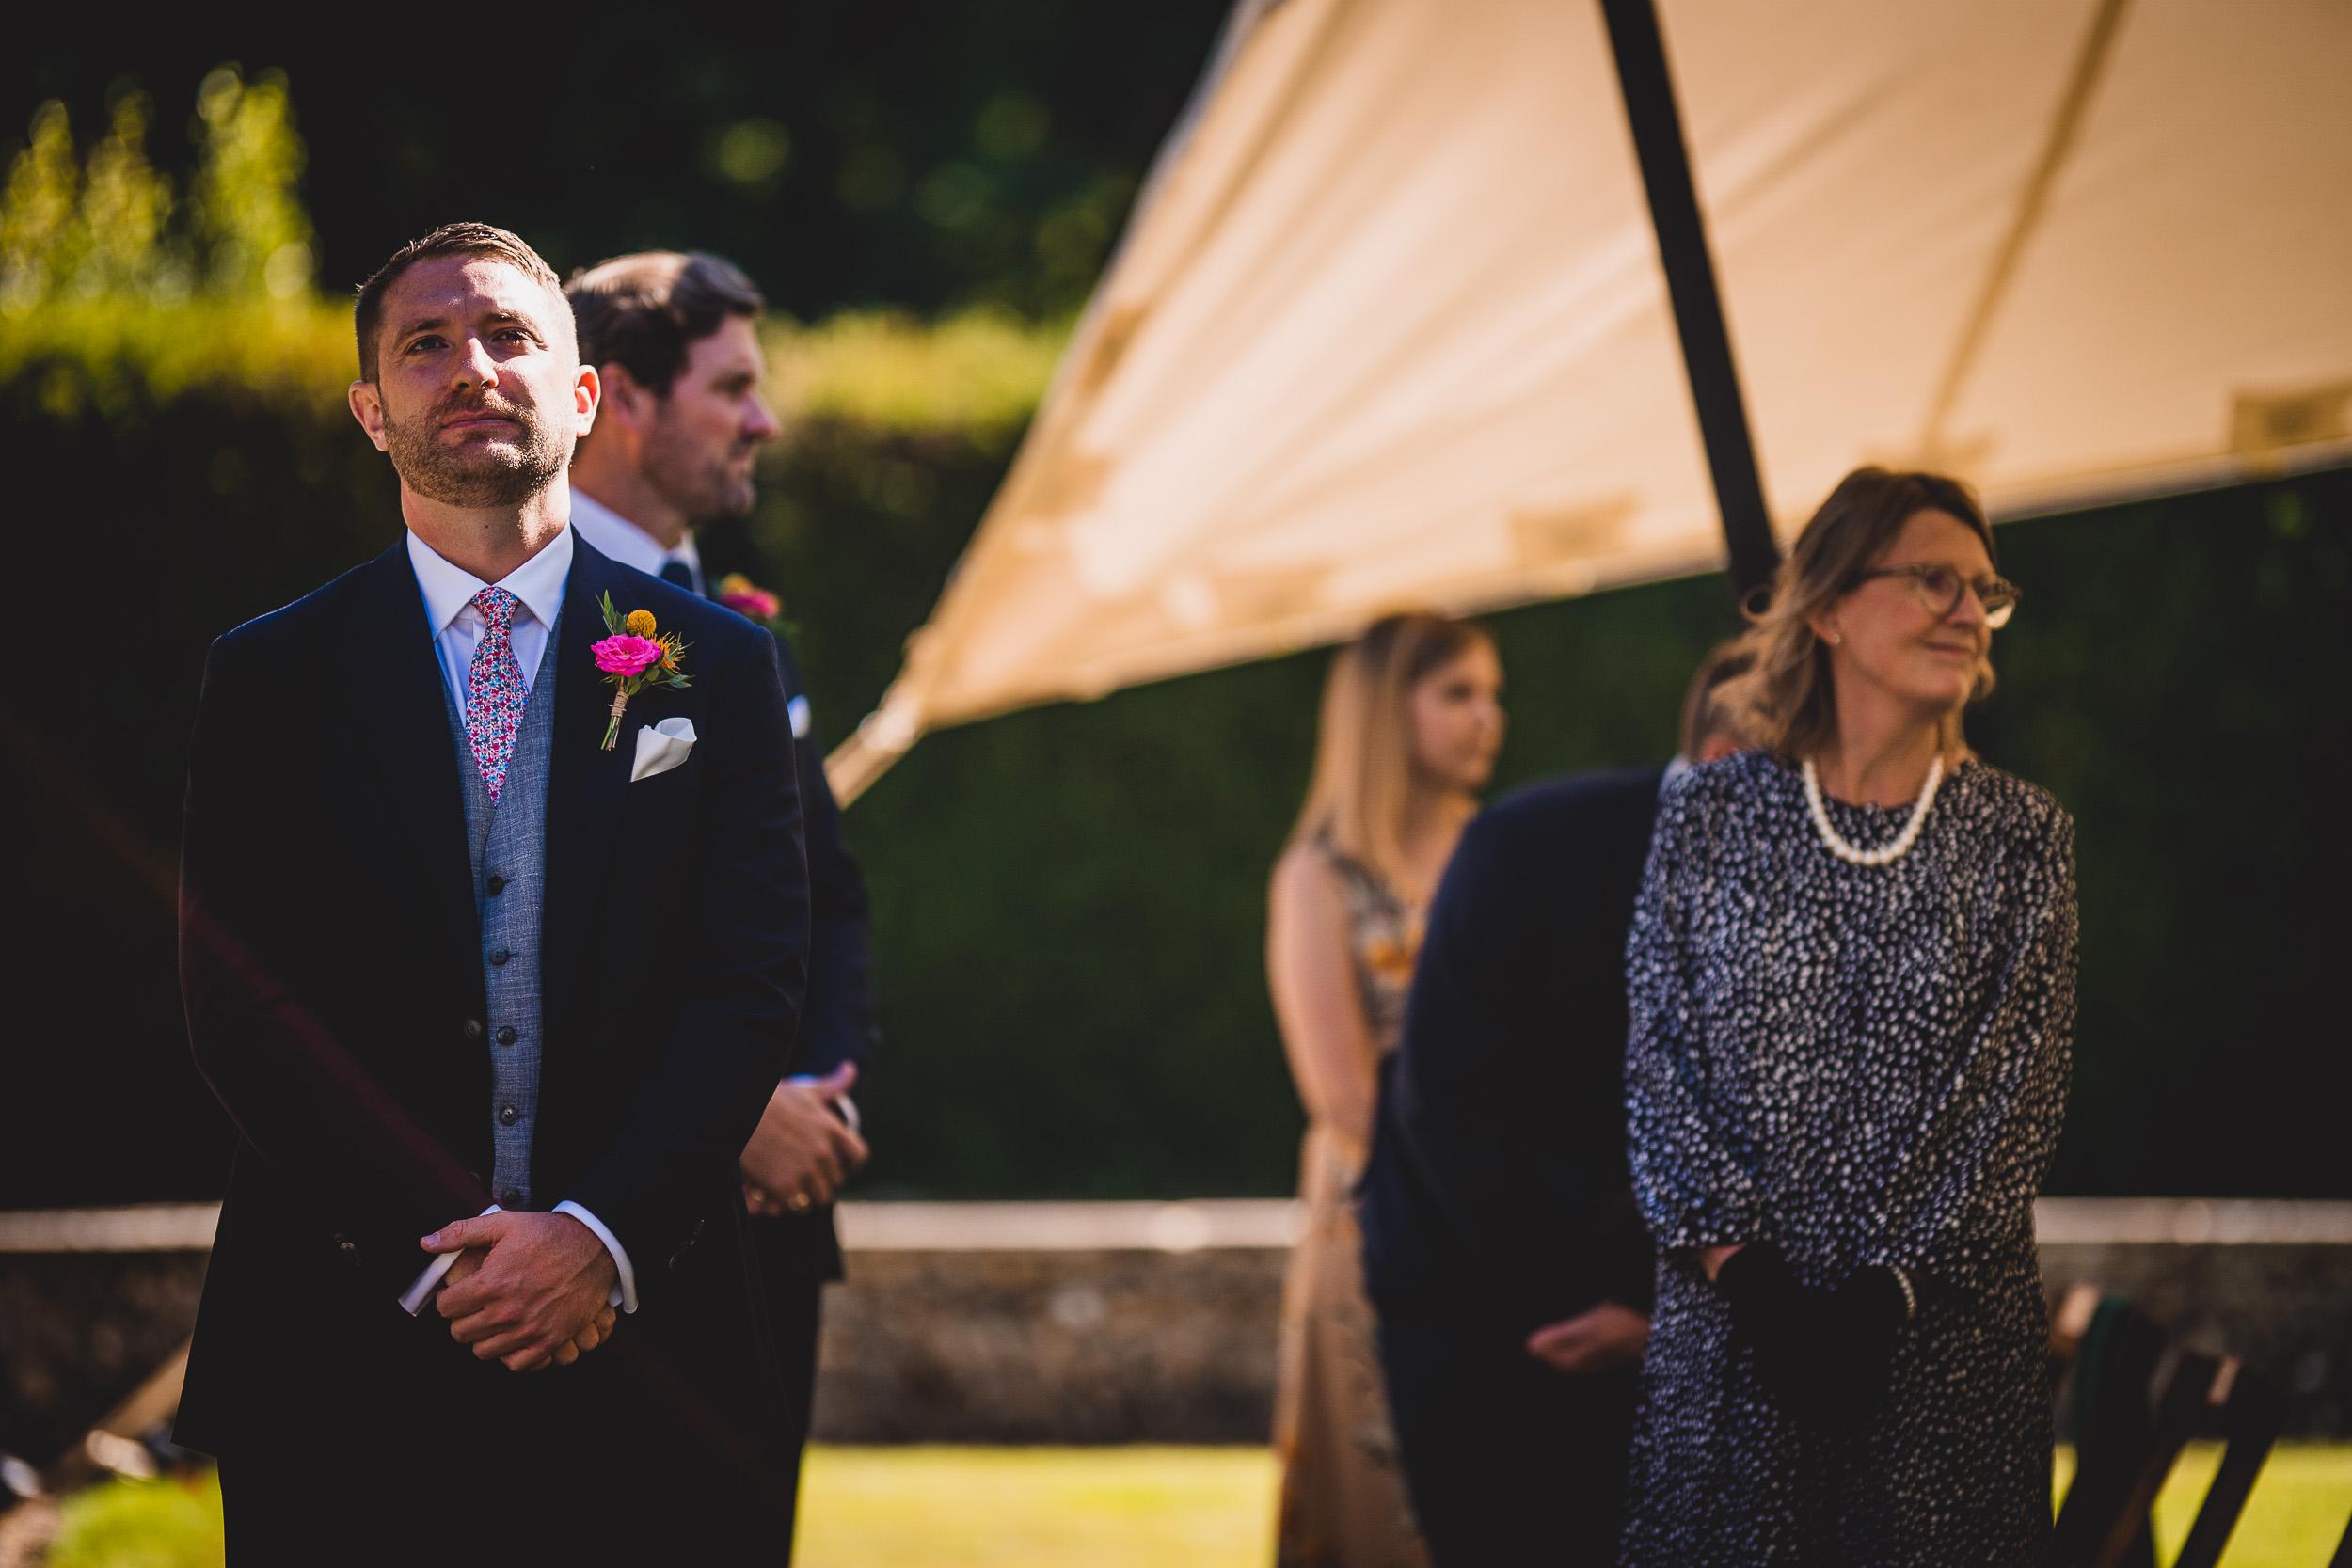 Voewood Wedding Photography | Al & Clancy Al ss 036